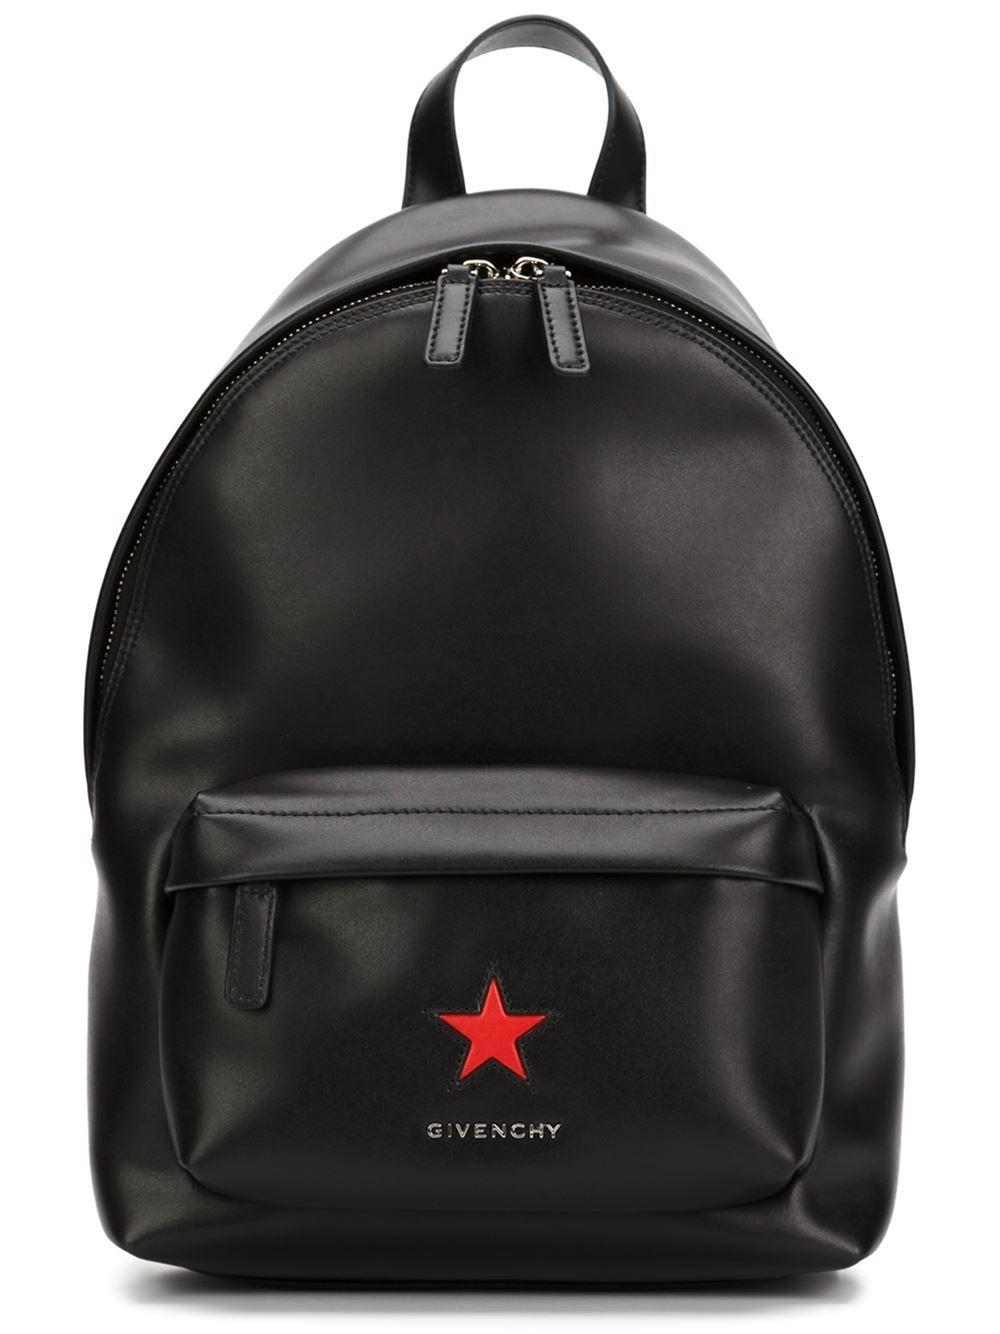 78923c760b givenchy  backpack  black  fashion  style  newin www.jofre.eu